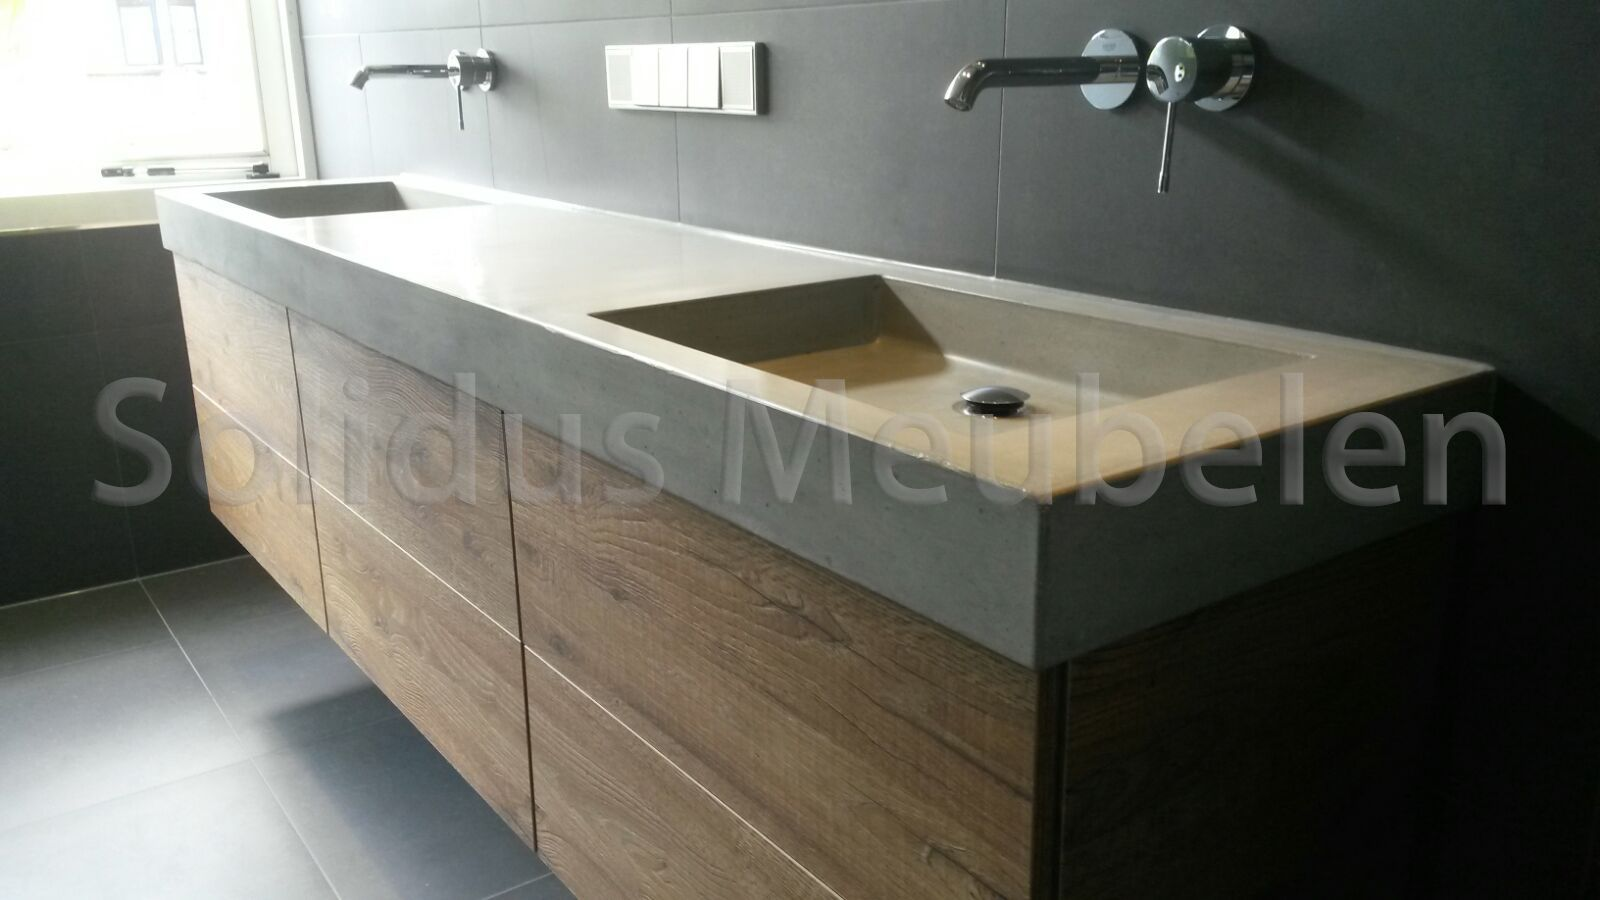 Badkamermeubel hout en beton | B7. Restroom Ideas | Pinterest ...